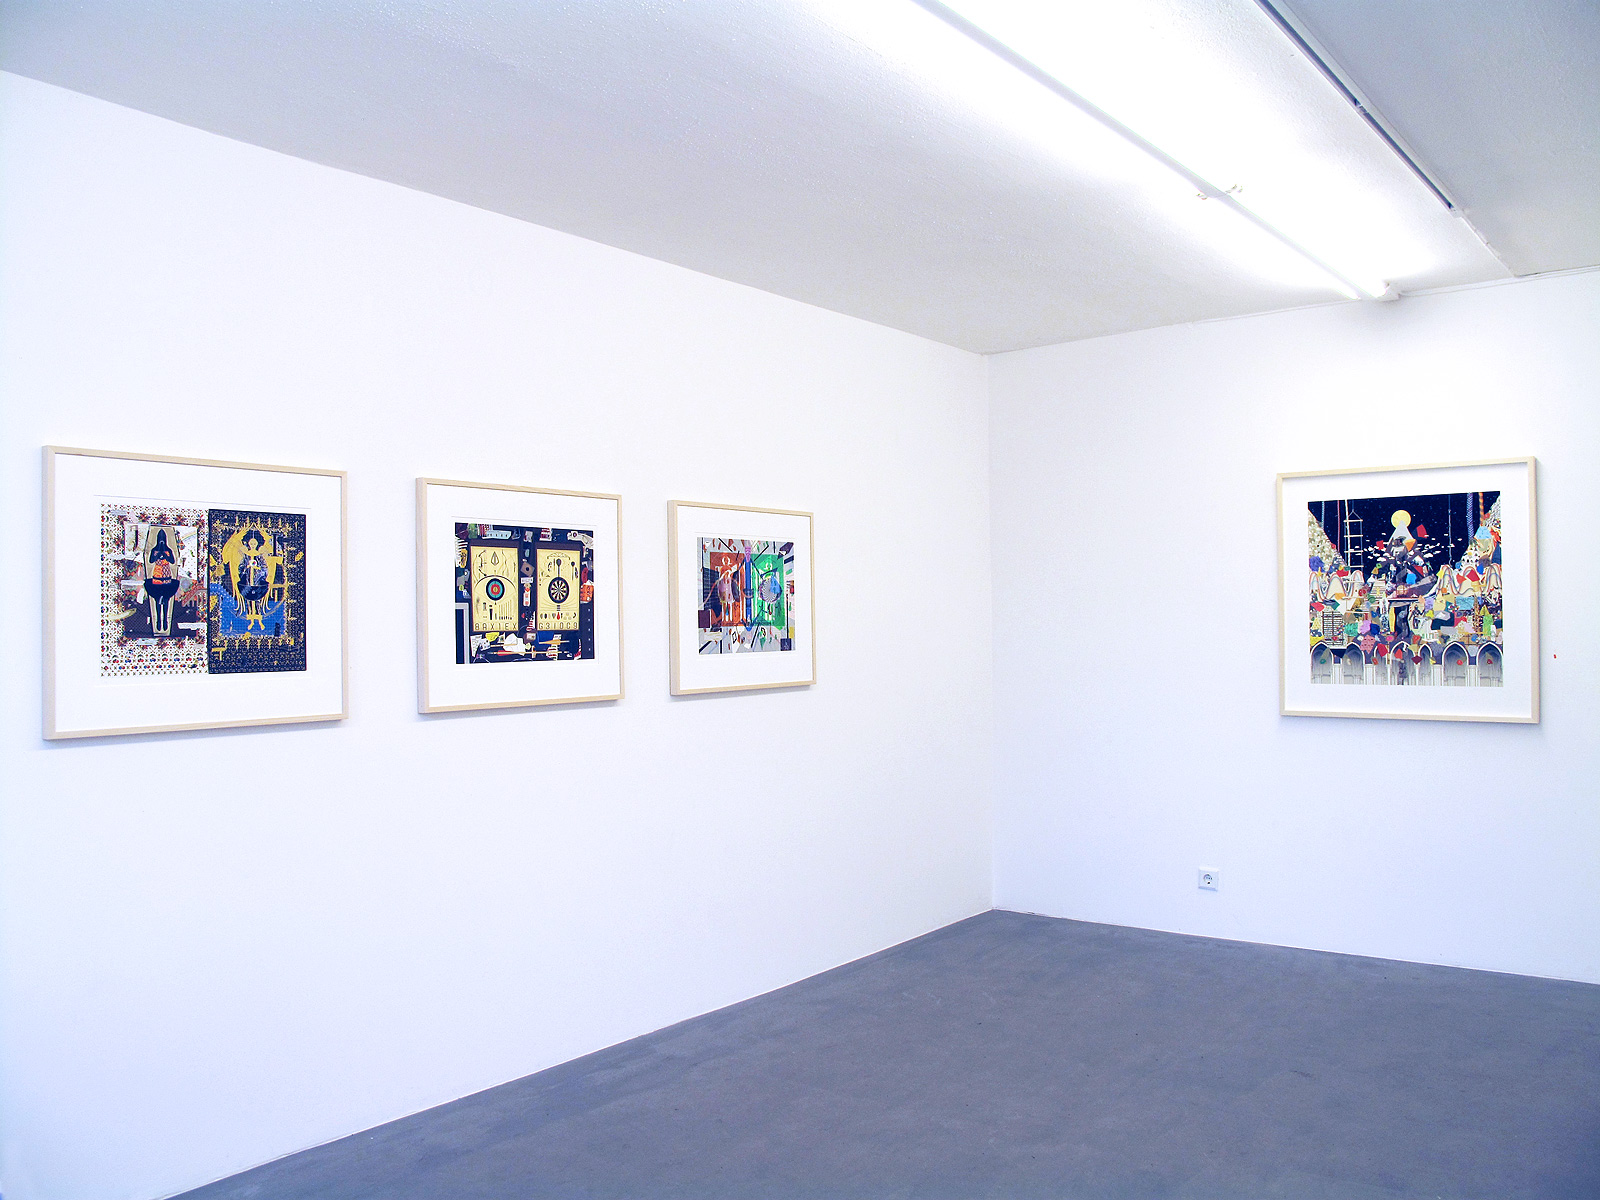 Gustav Sparr, Manuscript - The Chinvat Bridge (Heavenly Twin), 2016, 61.5 x 50.5 cm, Terminal-MeMeX, 2016, 61.5 x 50.5 cm, Template - I X I = I, 2016, 61.5 x 50.5 cm, Mount, 2014, 90 x 95 cm, allI nkjet